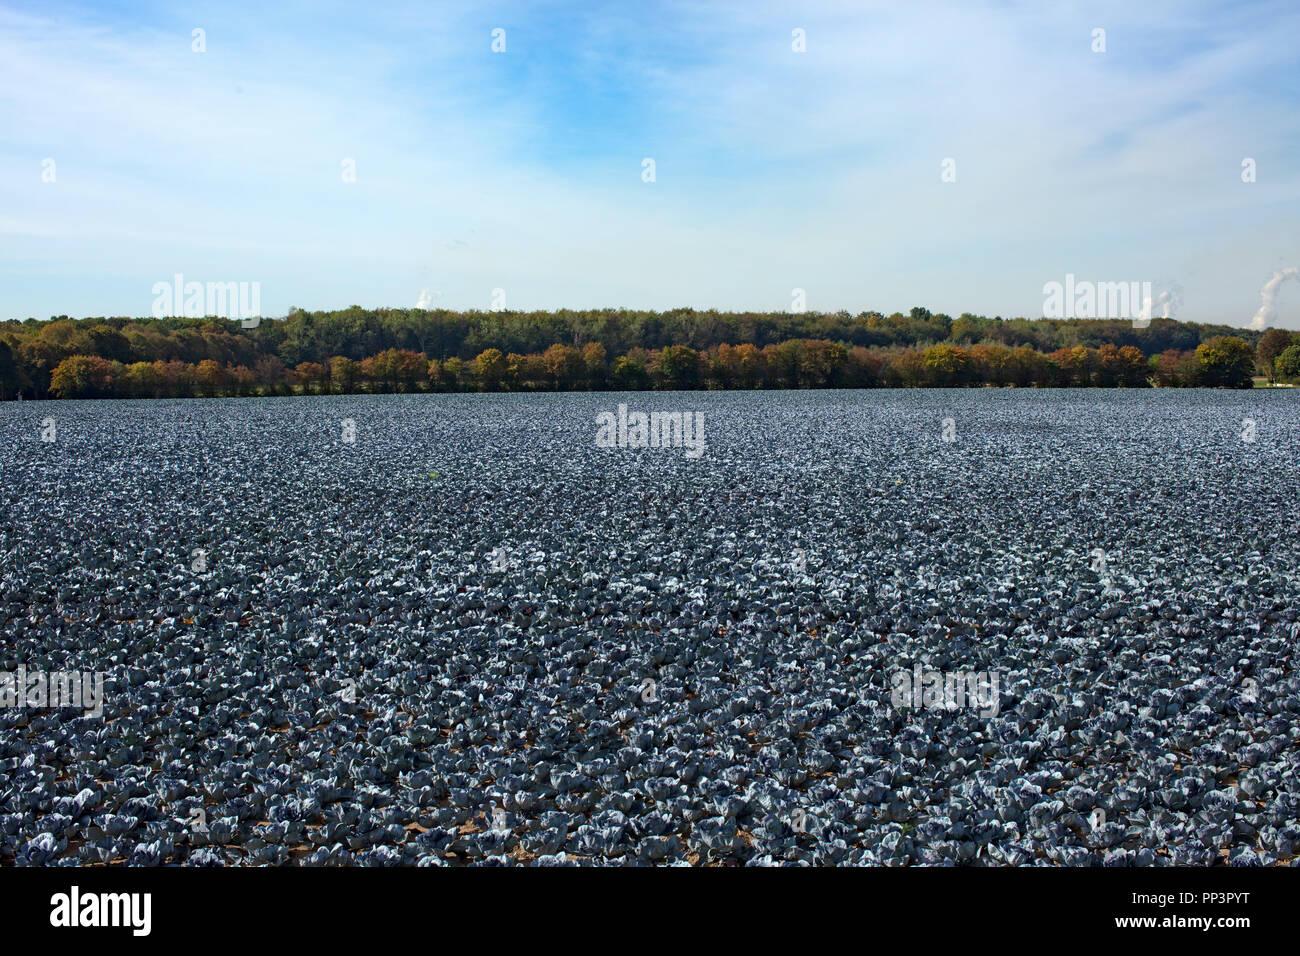 Red Cabbage field, Rotkohlfeld - Stock Image